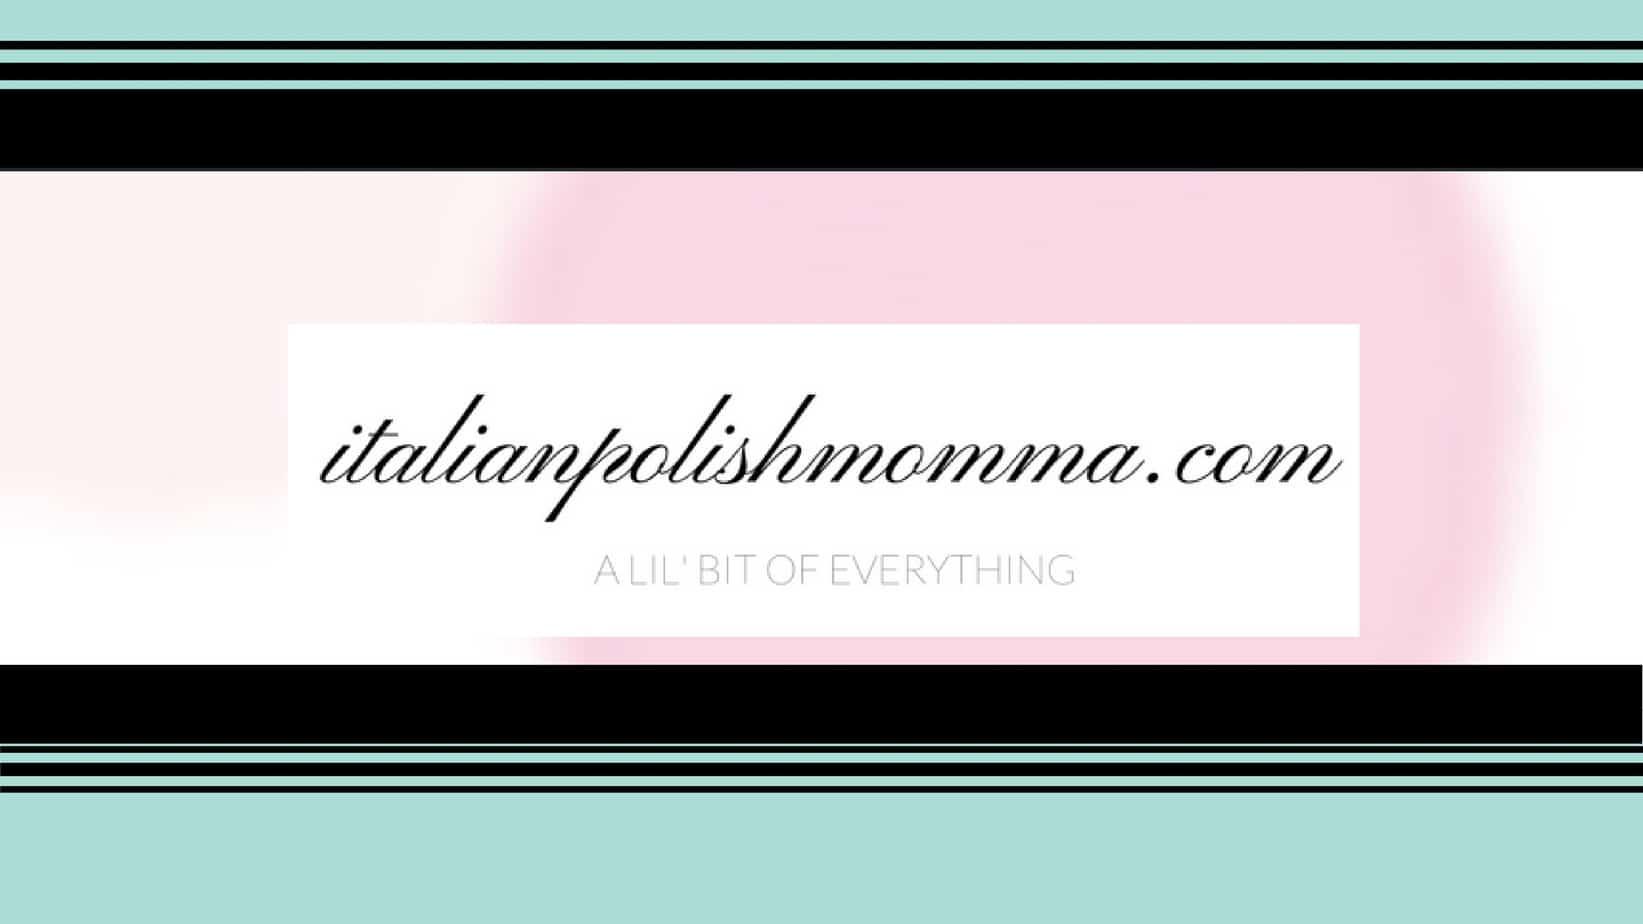 italianpolishmomma.com